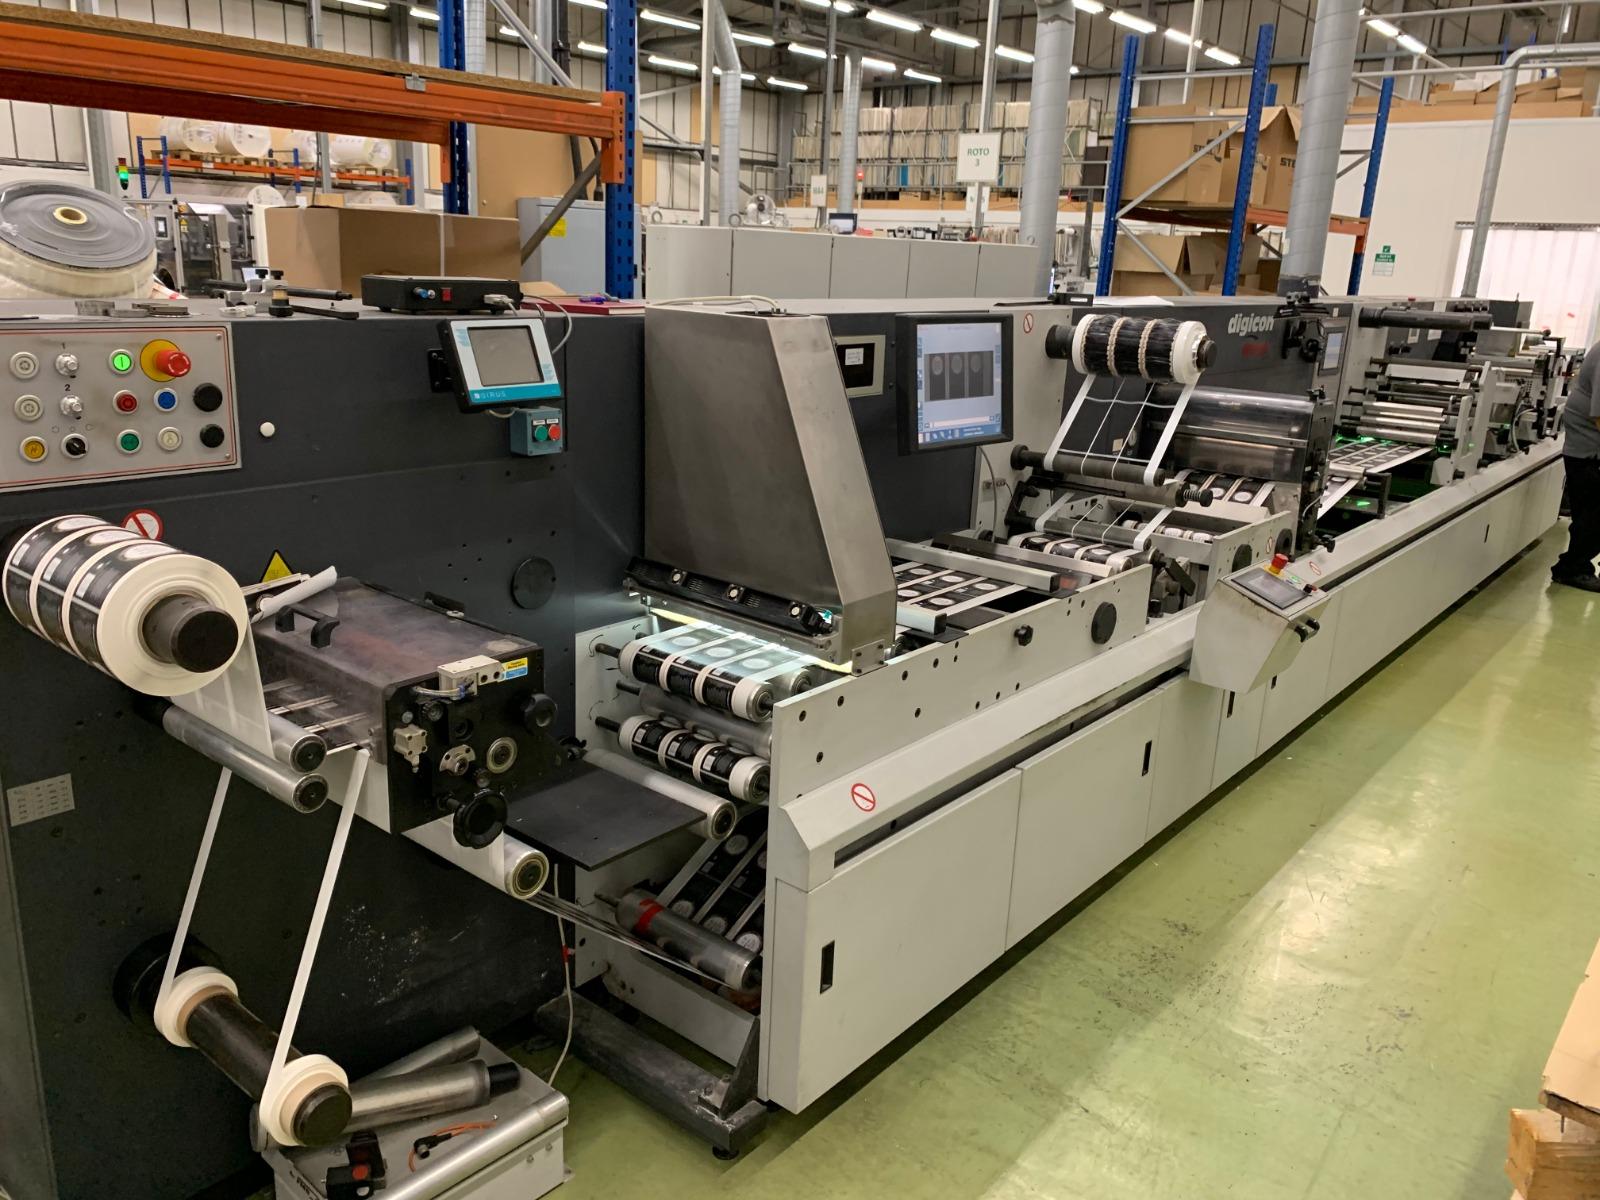 ABG Digicon Series 1 - Used Flexo Printing Presses and Used Flexographic Equipment-0